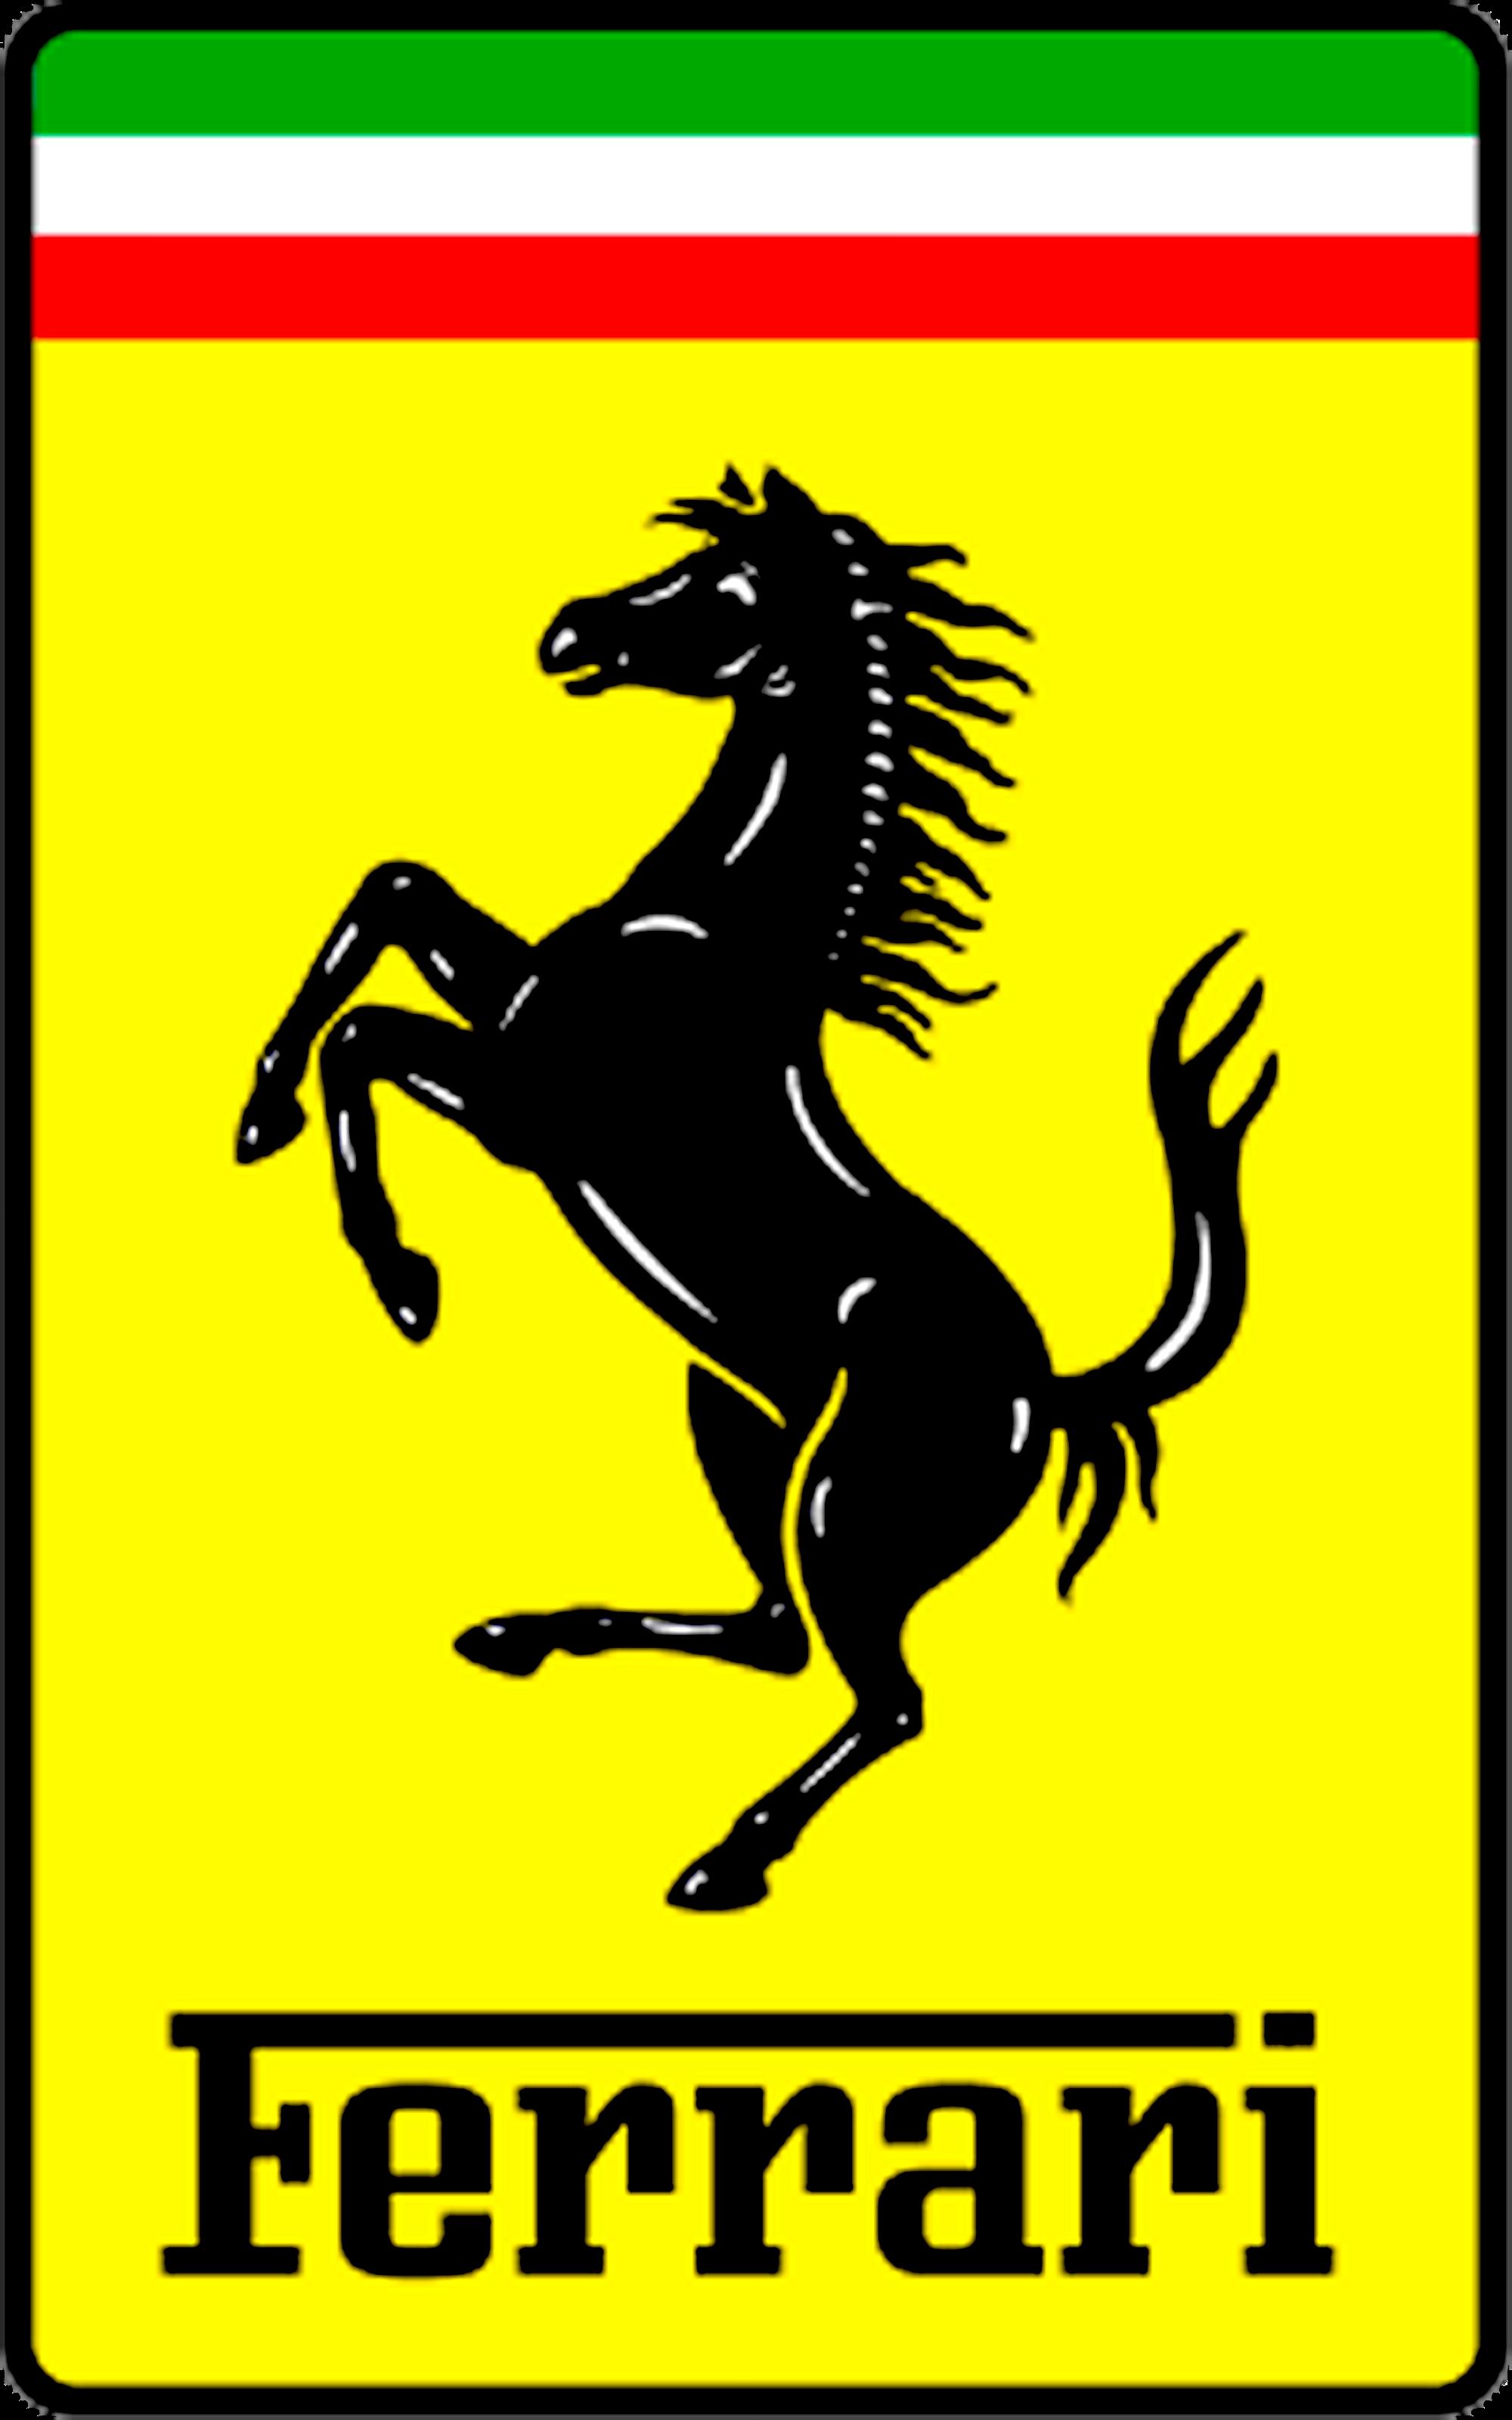 Italian Car Brands Companies And Manufacturers Car Brand Names Com